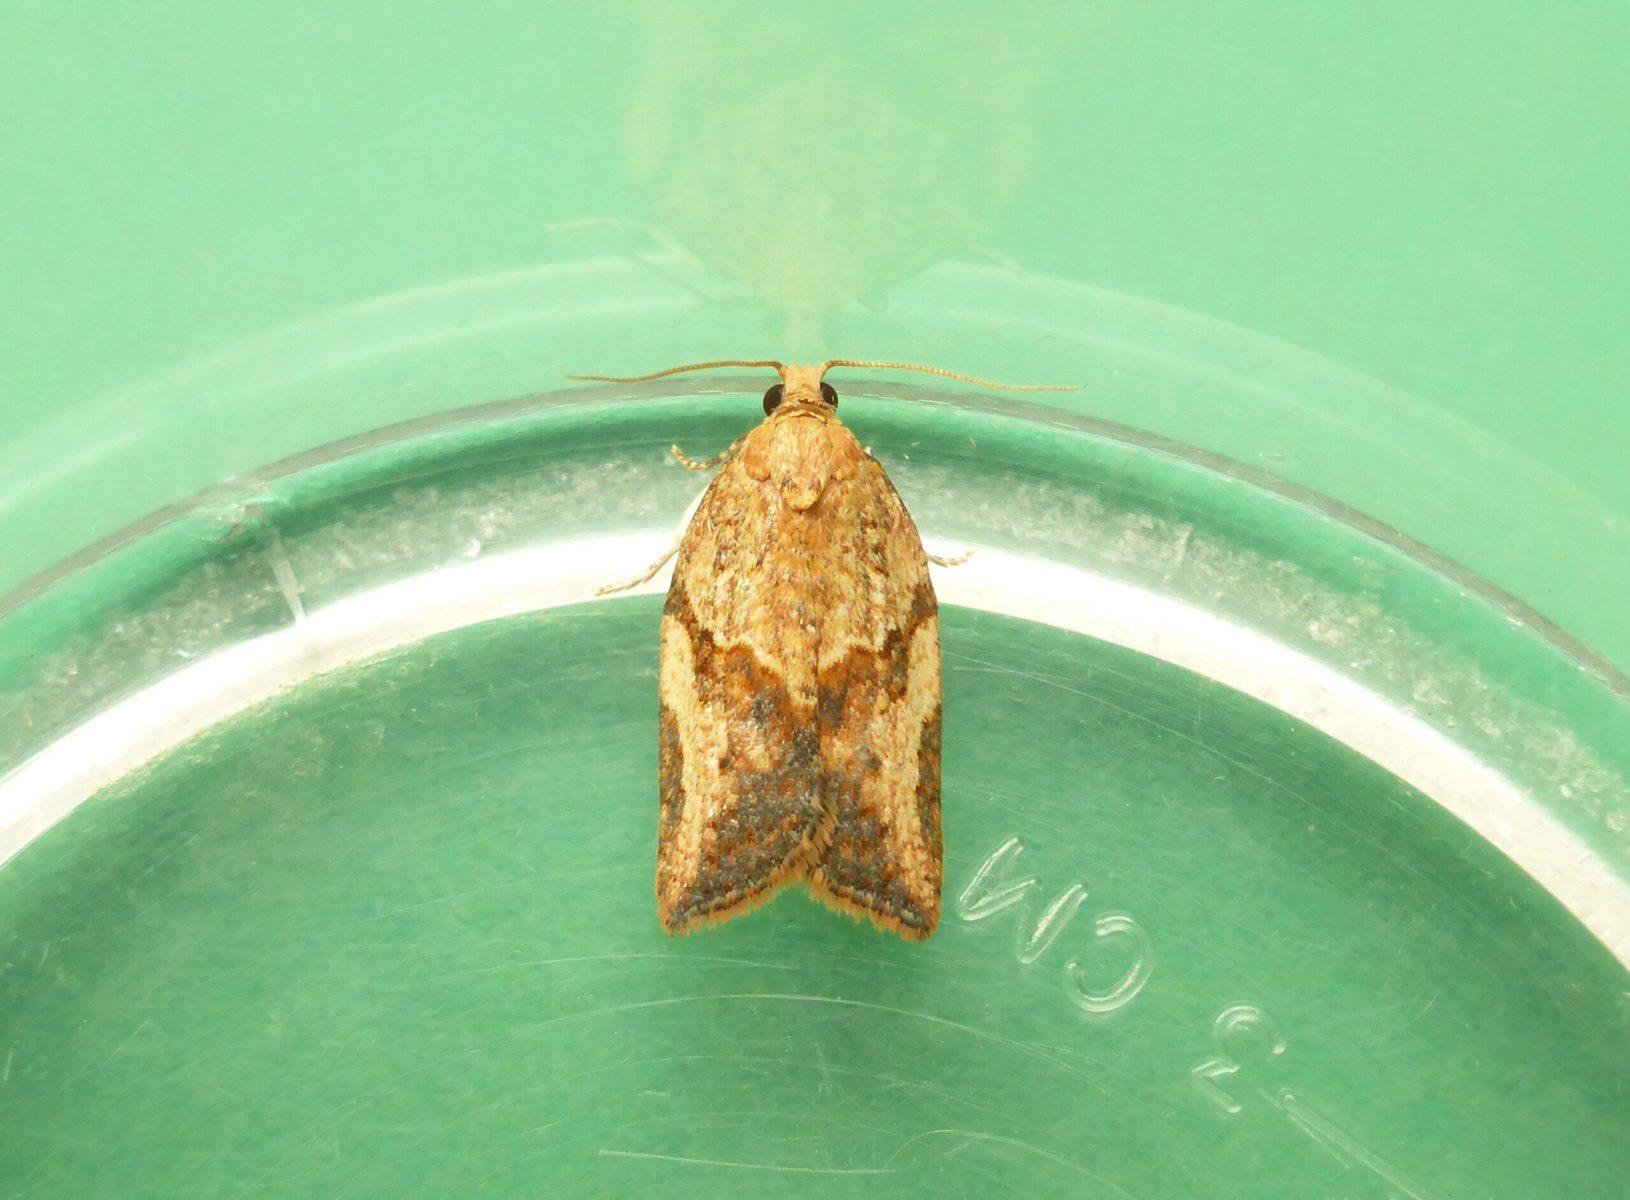 Epiphyas postvittana - Light Brown Apple Moth - KIrk Smeaton